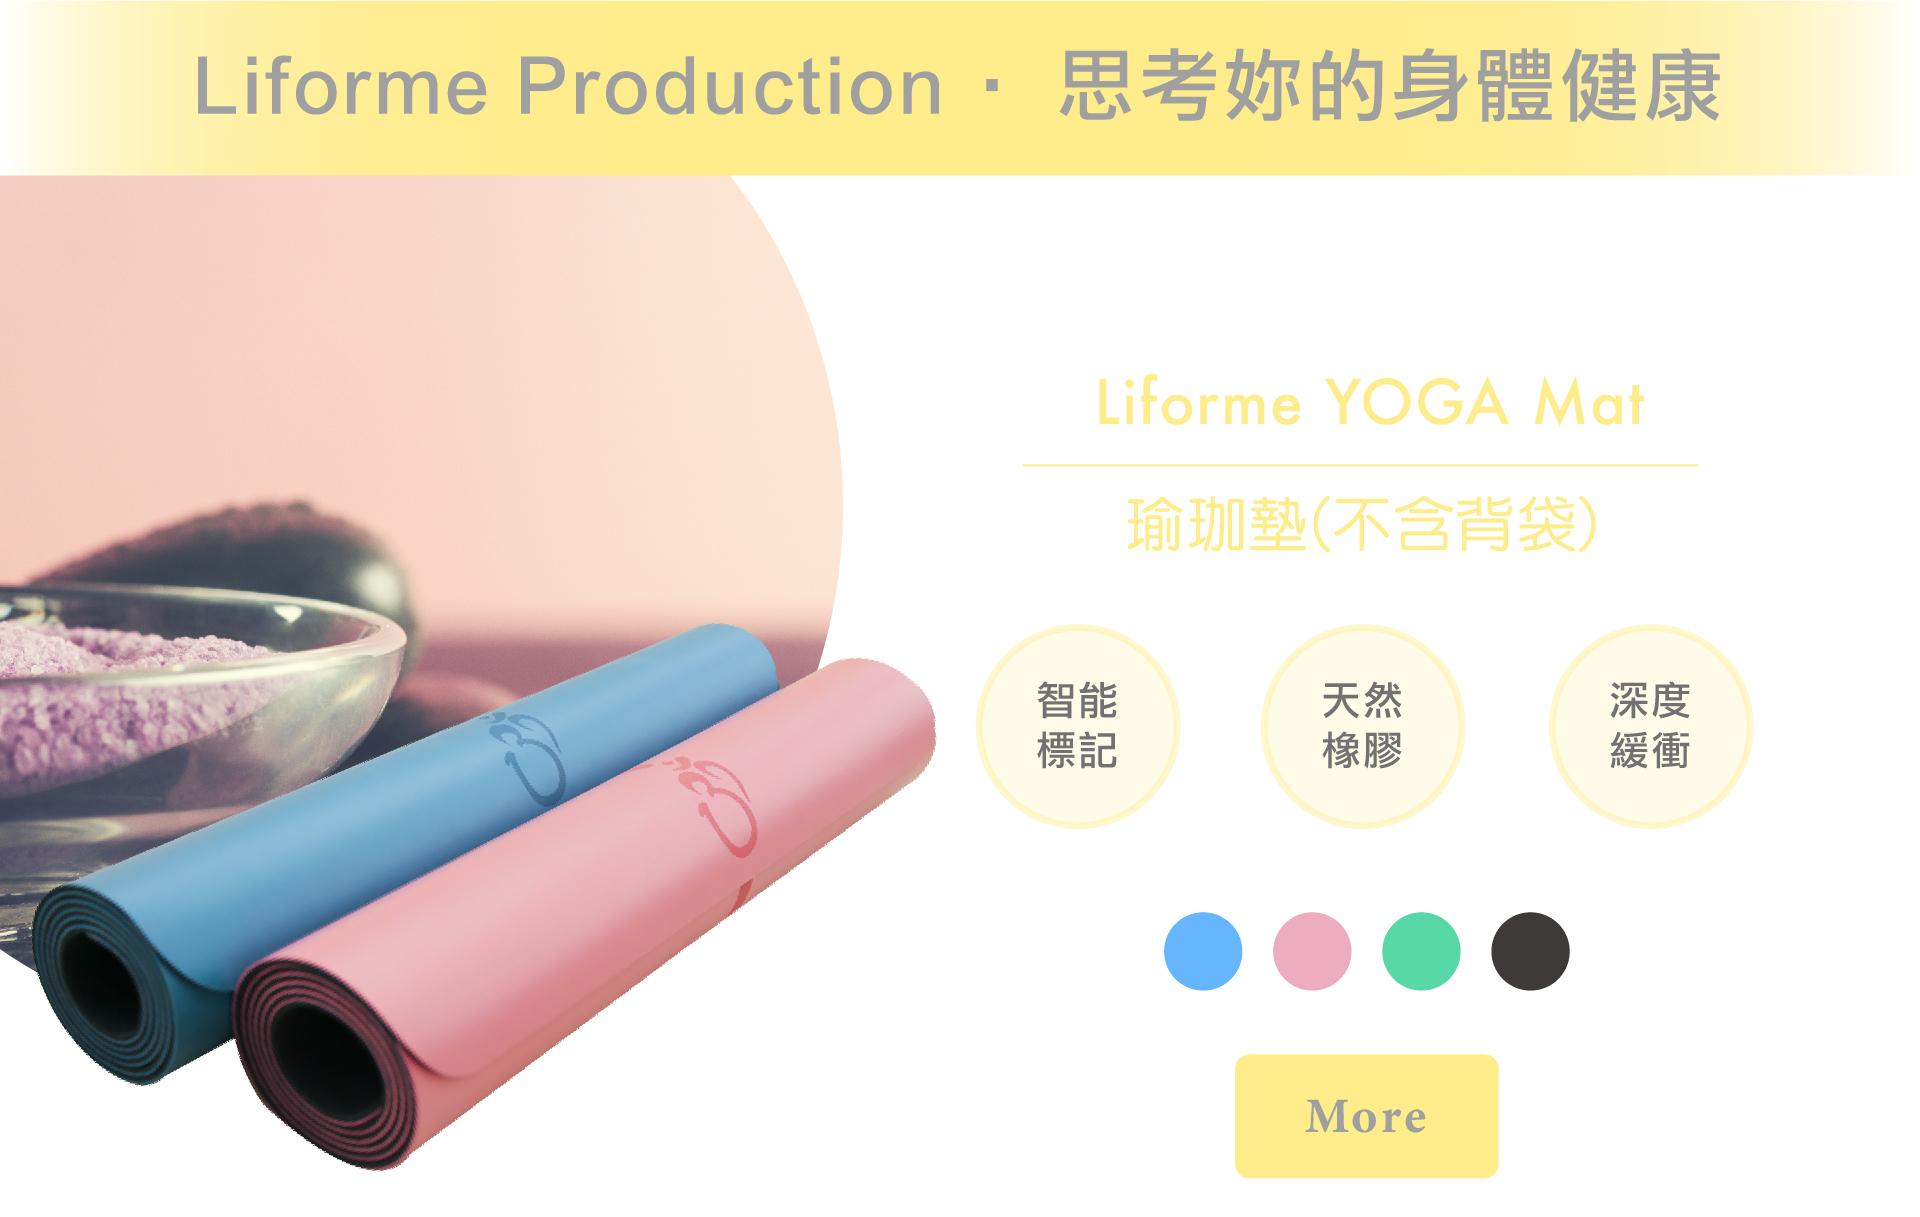 liforme yoga mat 瑜珈墊